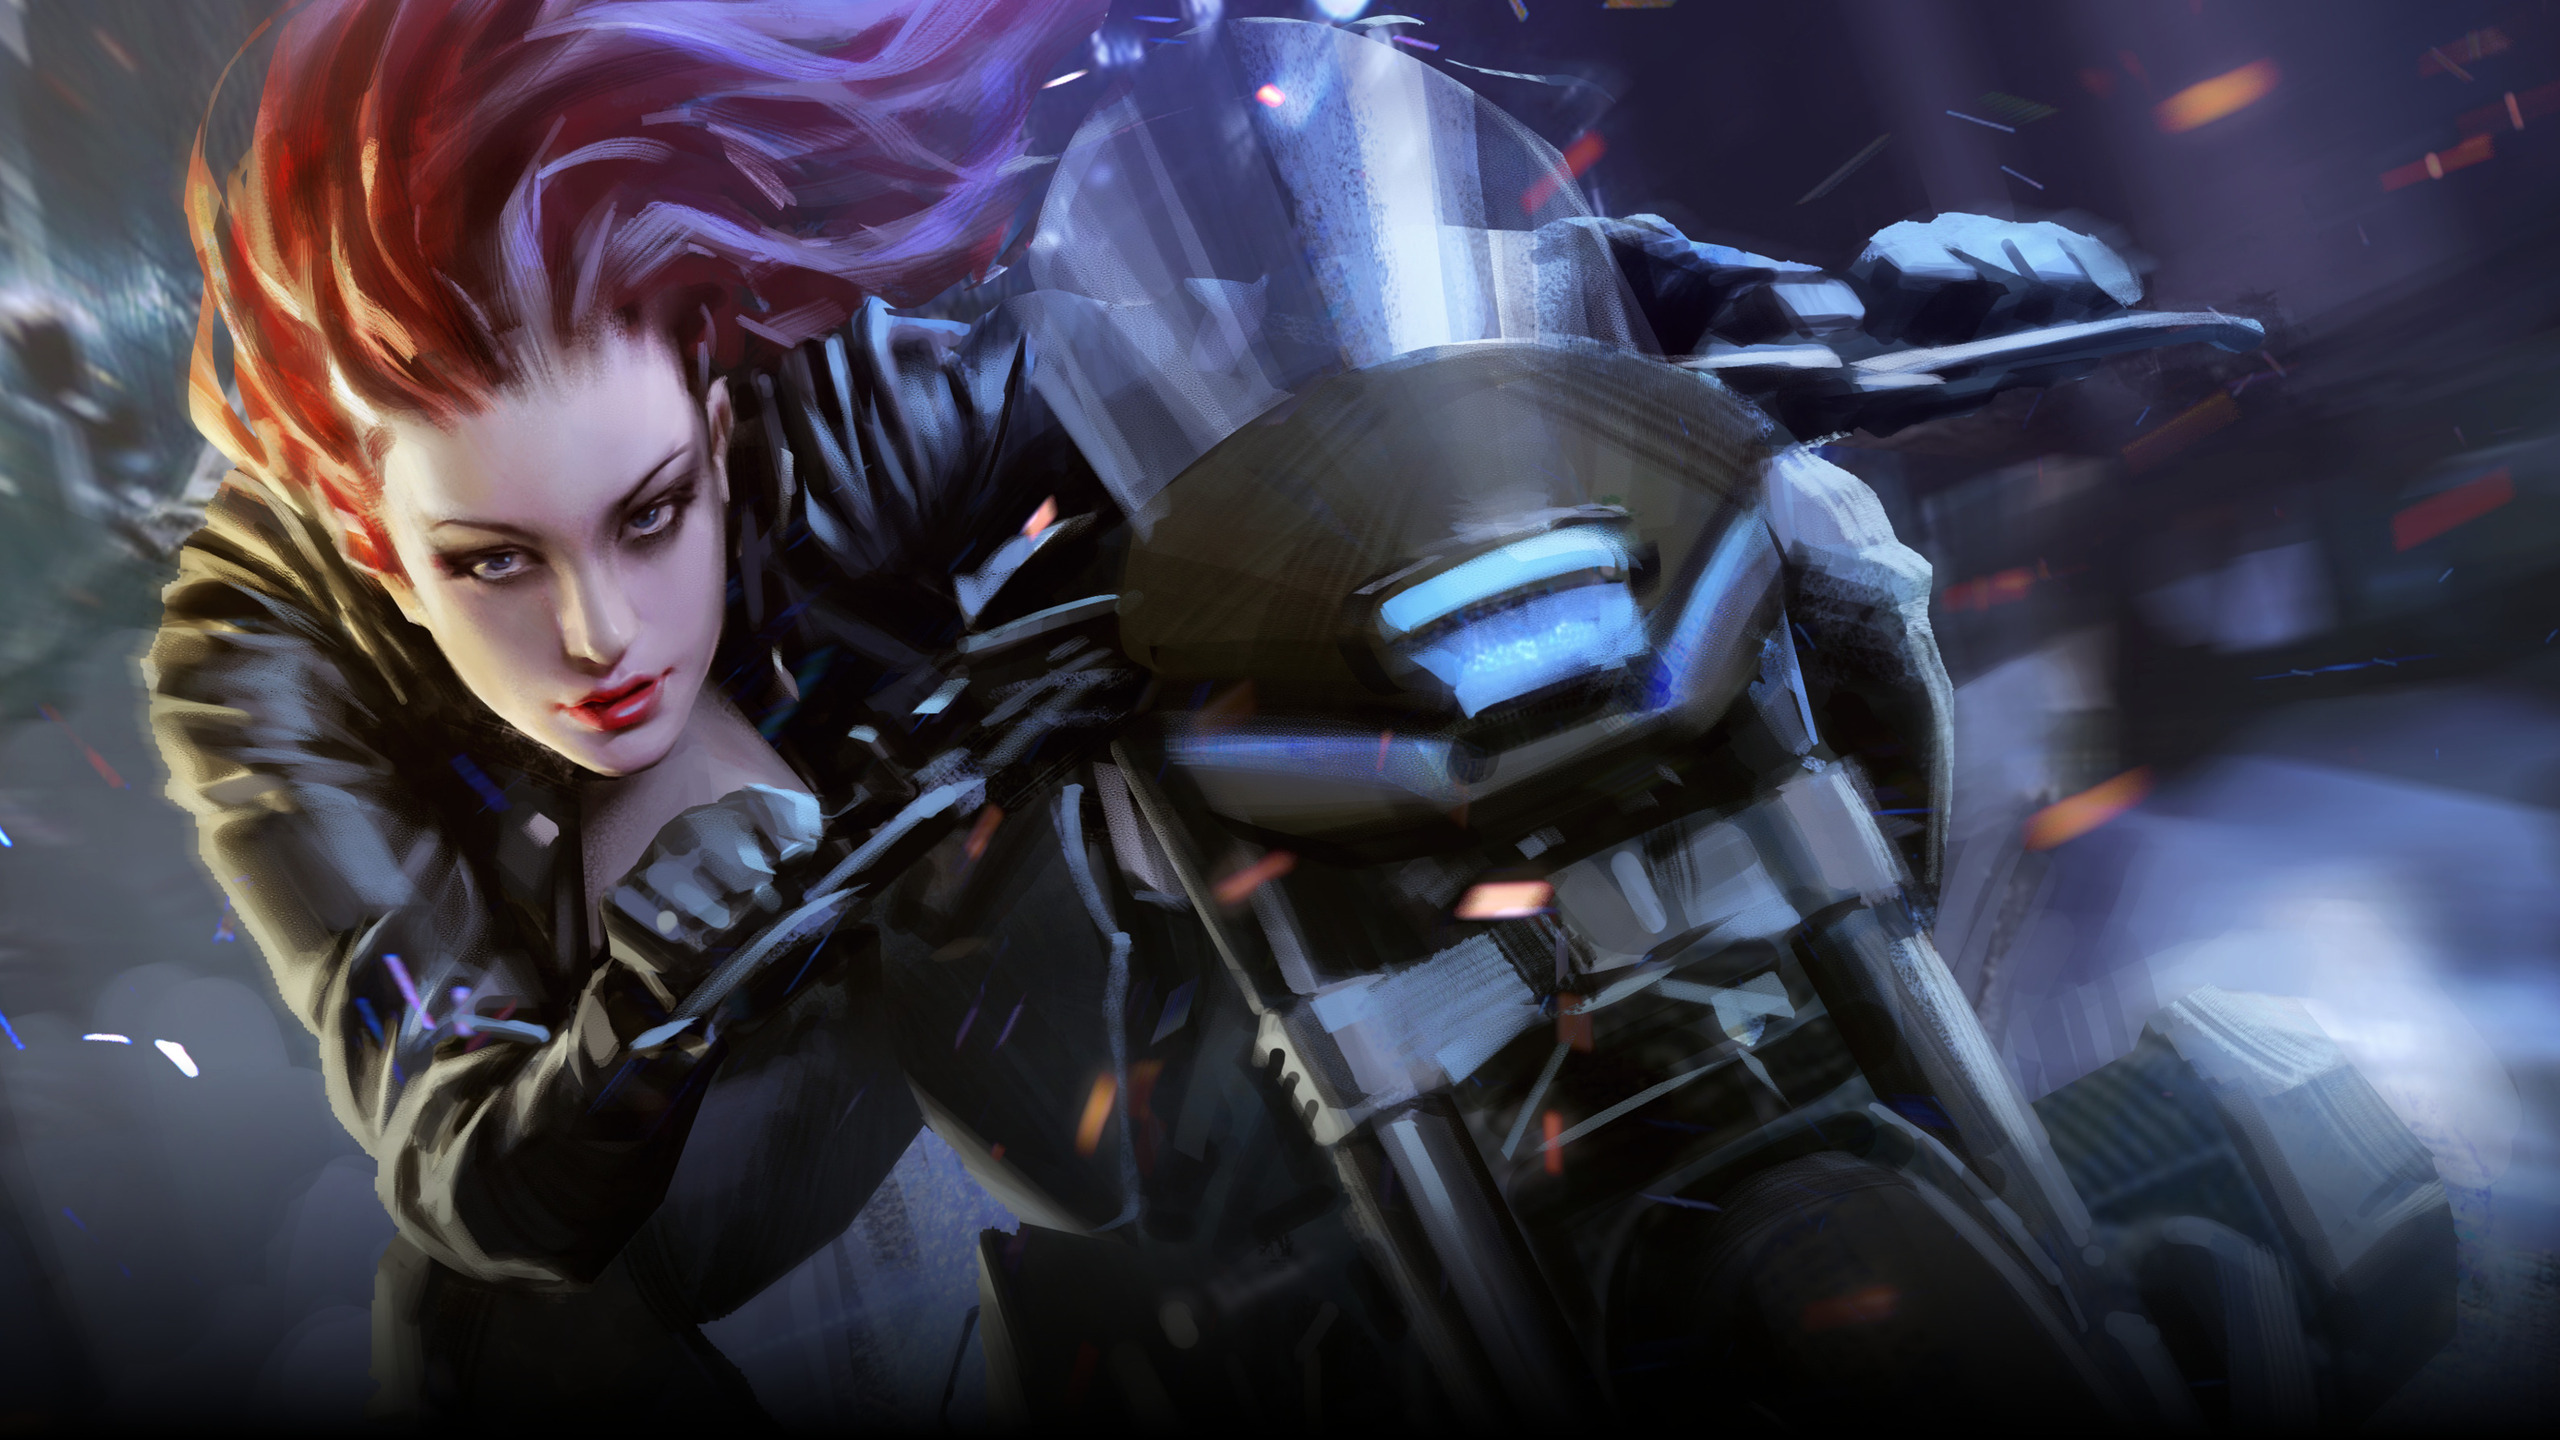 mythgard-game-girl-driving-bike-art-kw.jpg